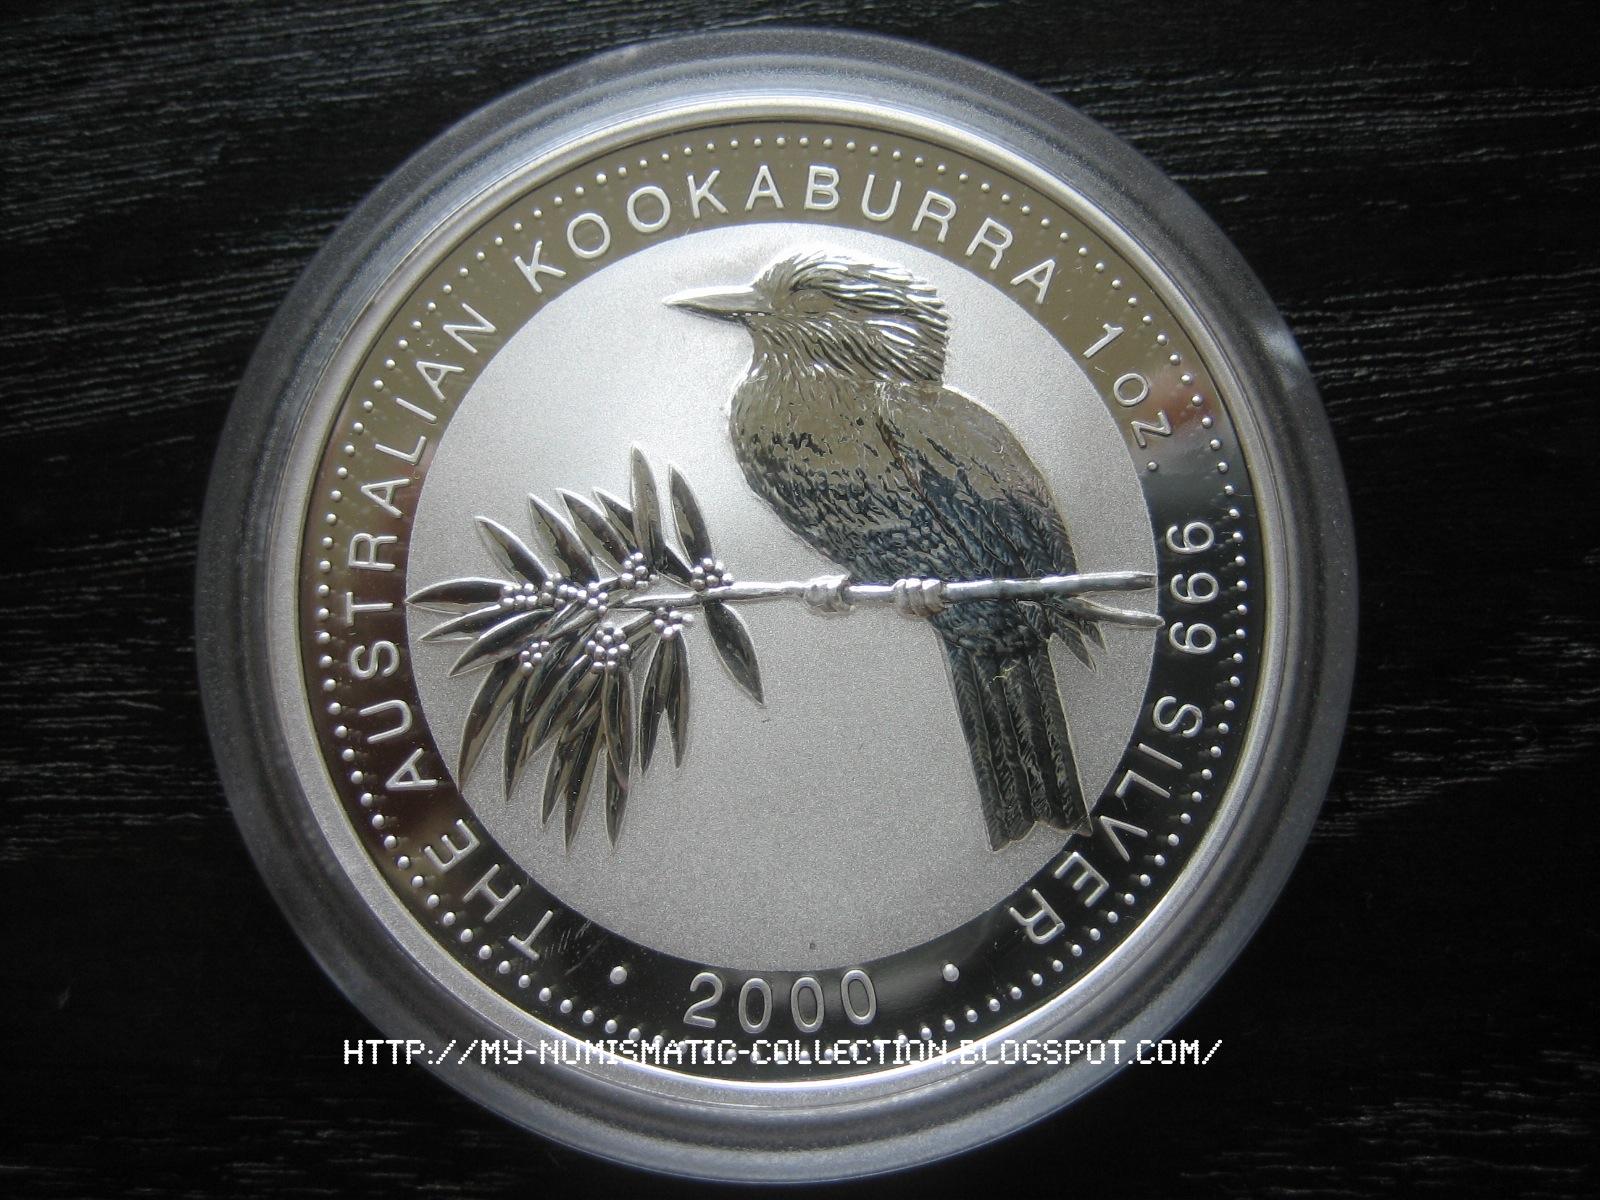 Numismatic Collection 2000 Australian Silver Kookaburra